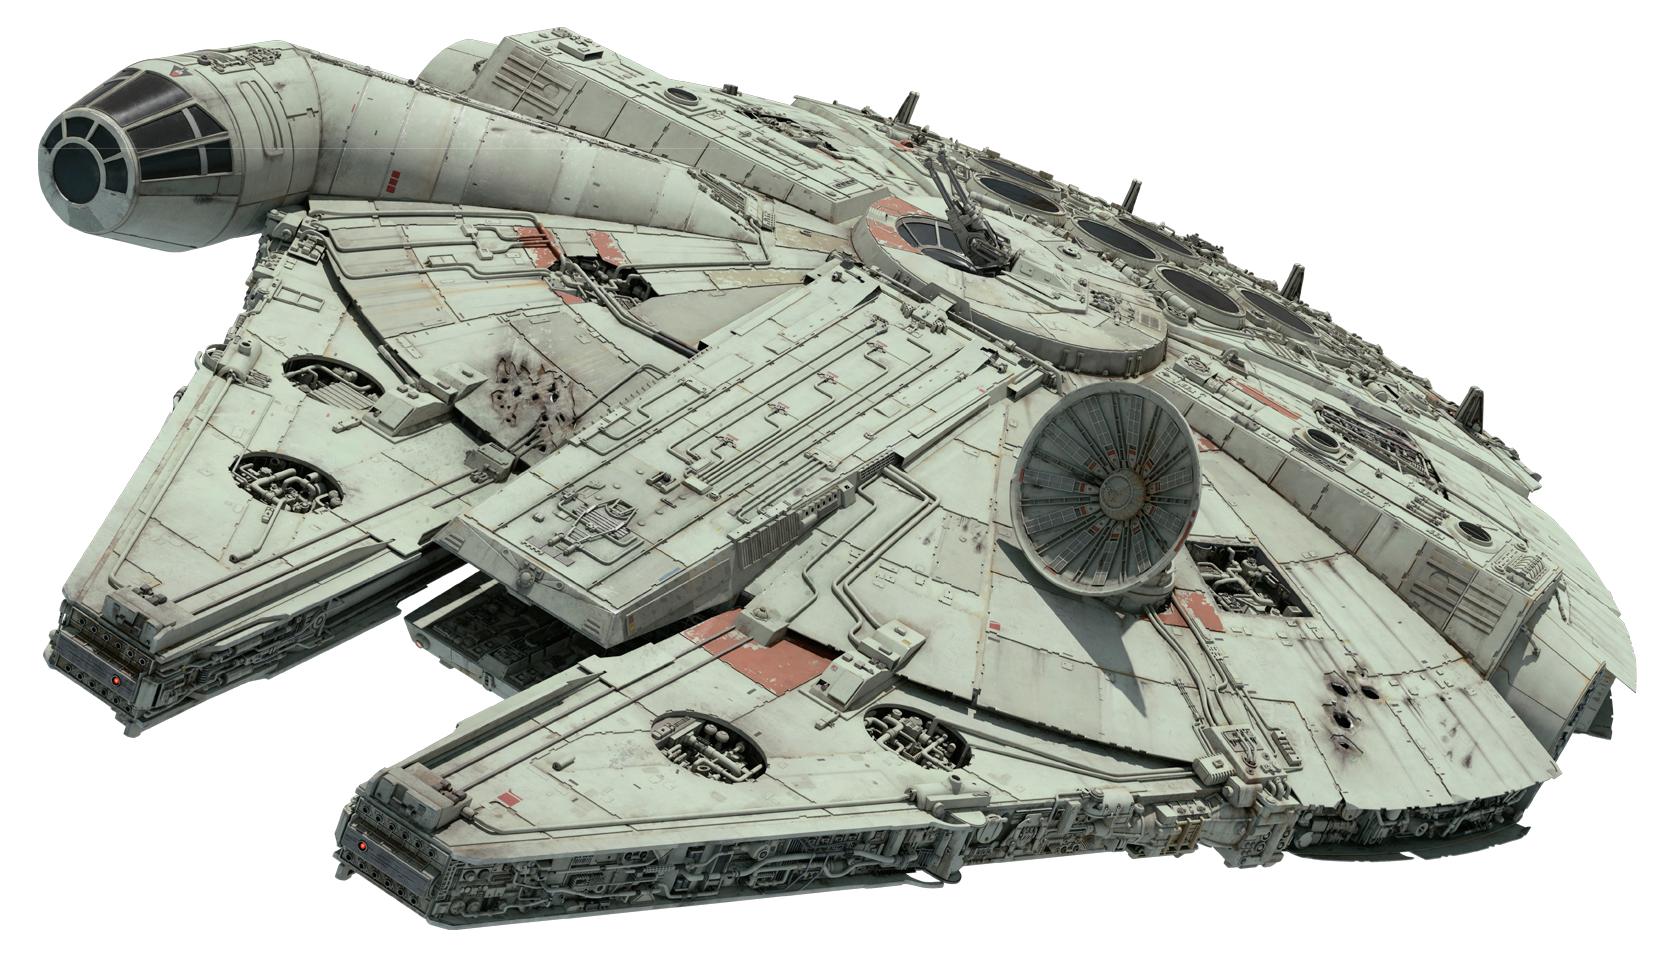 Millennium Falcon Wookieepedia Fandom Millennium Falcon Star Wars Ships Star Wars